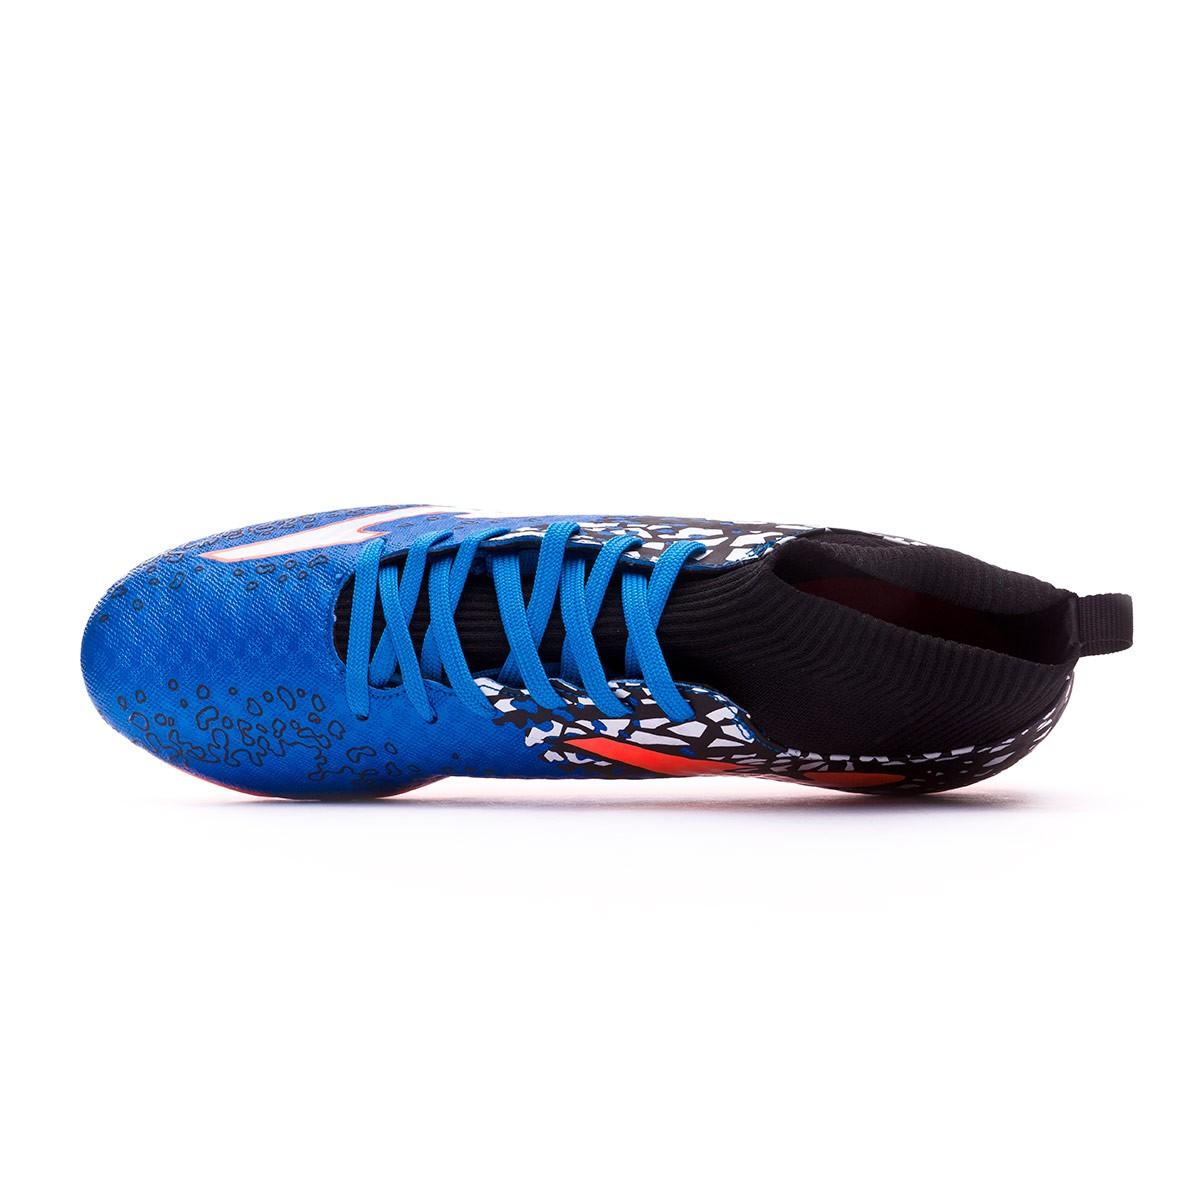 3e0cf147e9 Bota de fútbol Joma Champion AG Azul - Leaked soccer